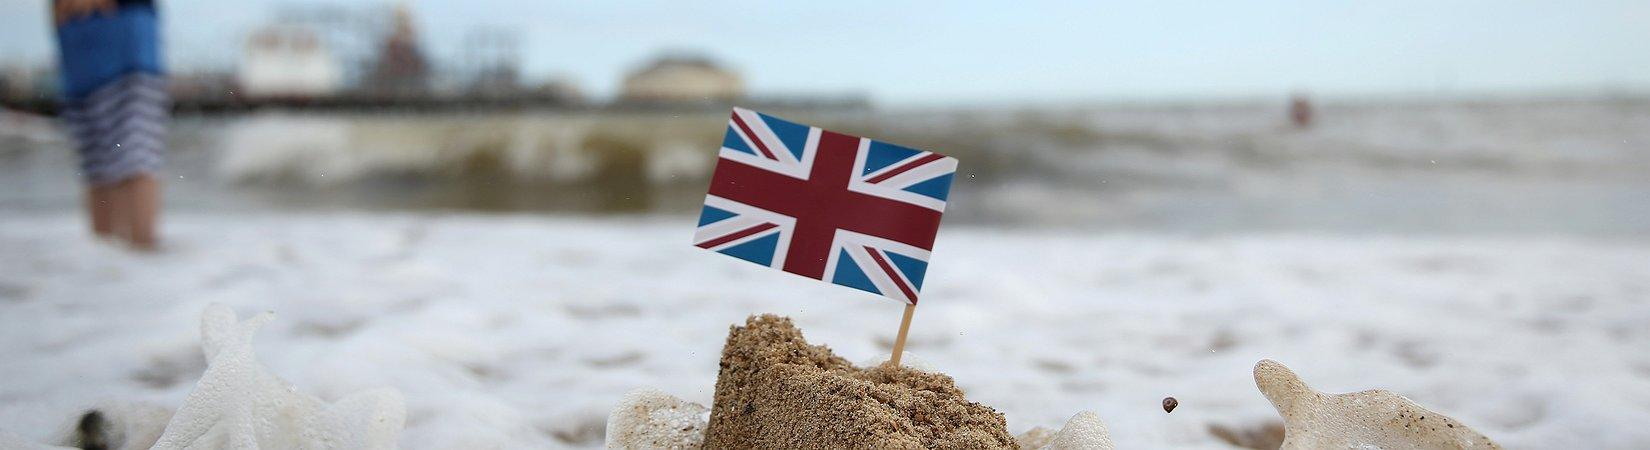 S&P: Brexit kommt auf dem harten Weg